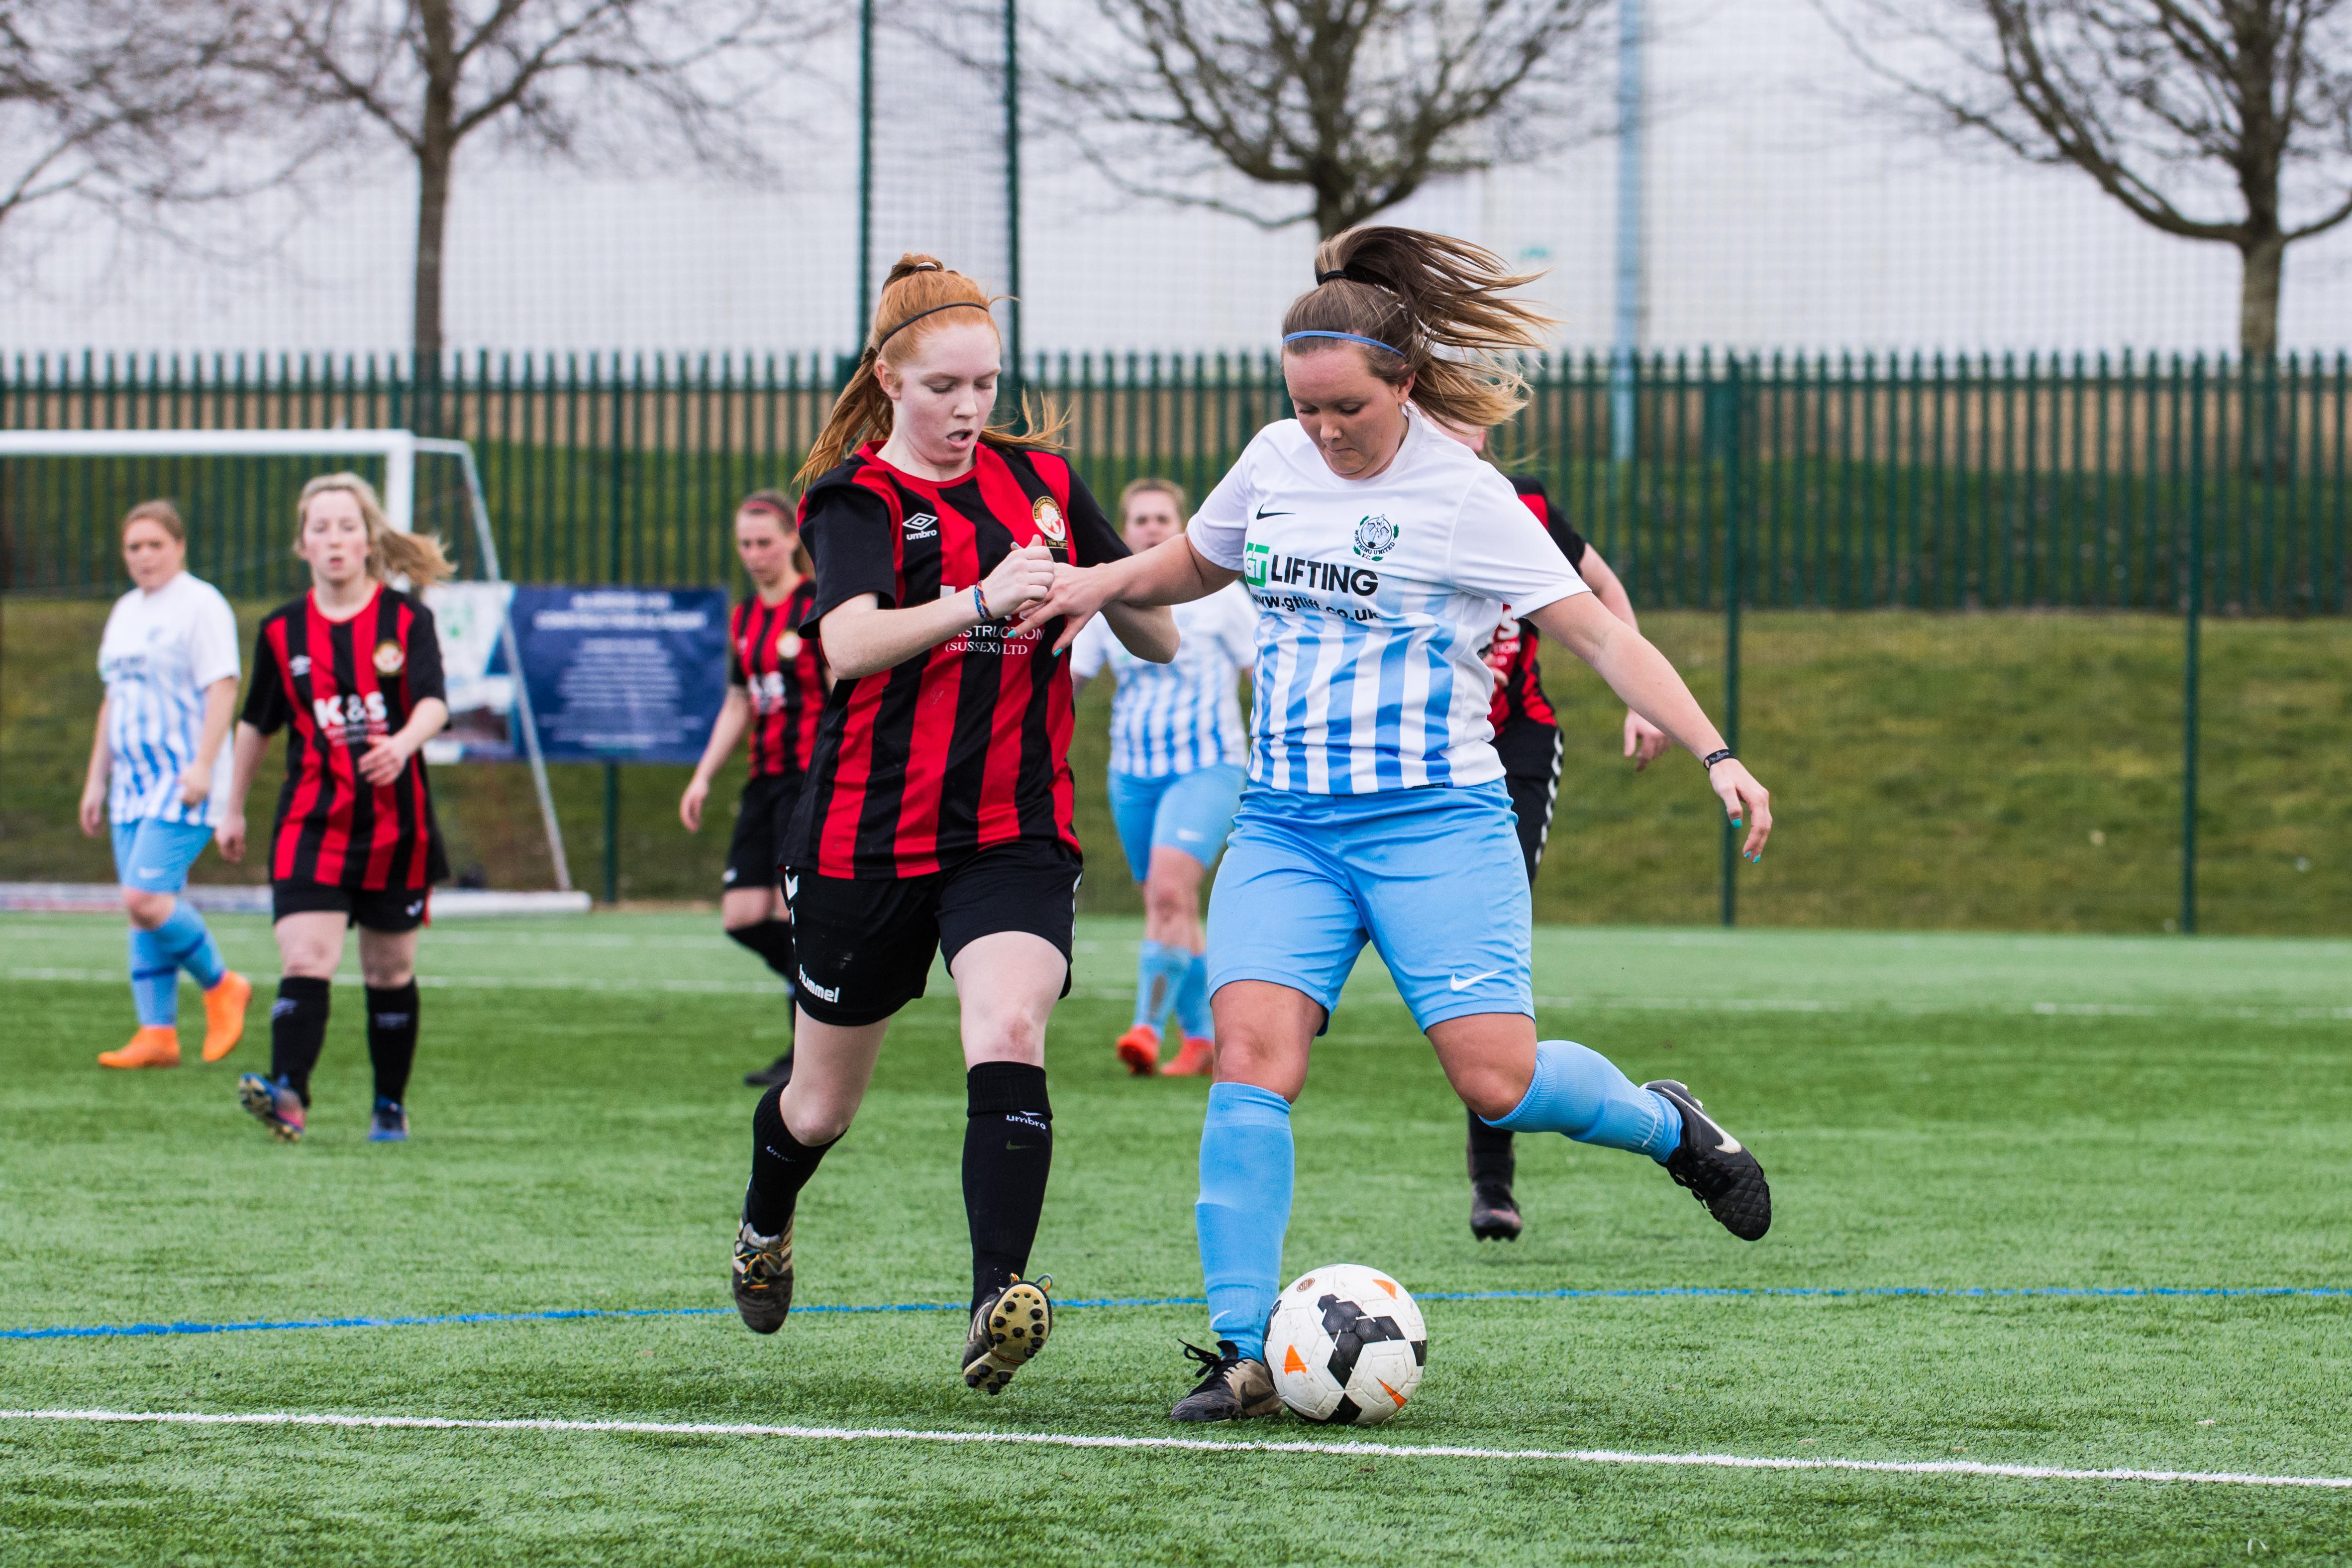 DAVID_JEFFERY Saltdean Utd Ladies FC vs Worthing Utd Ladies FC 11.03.18 35